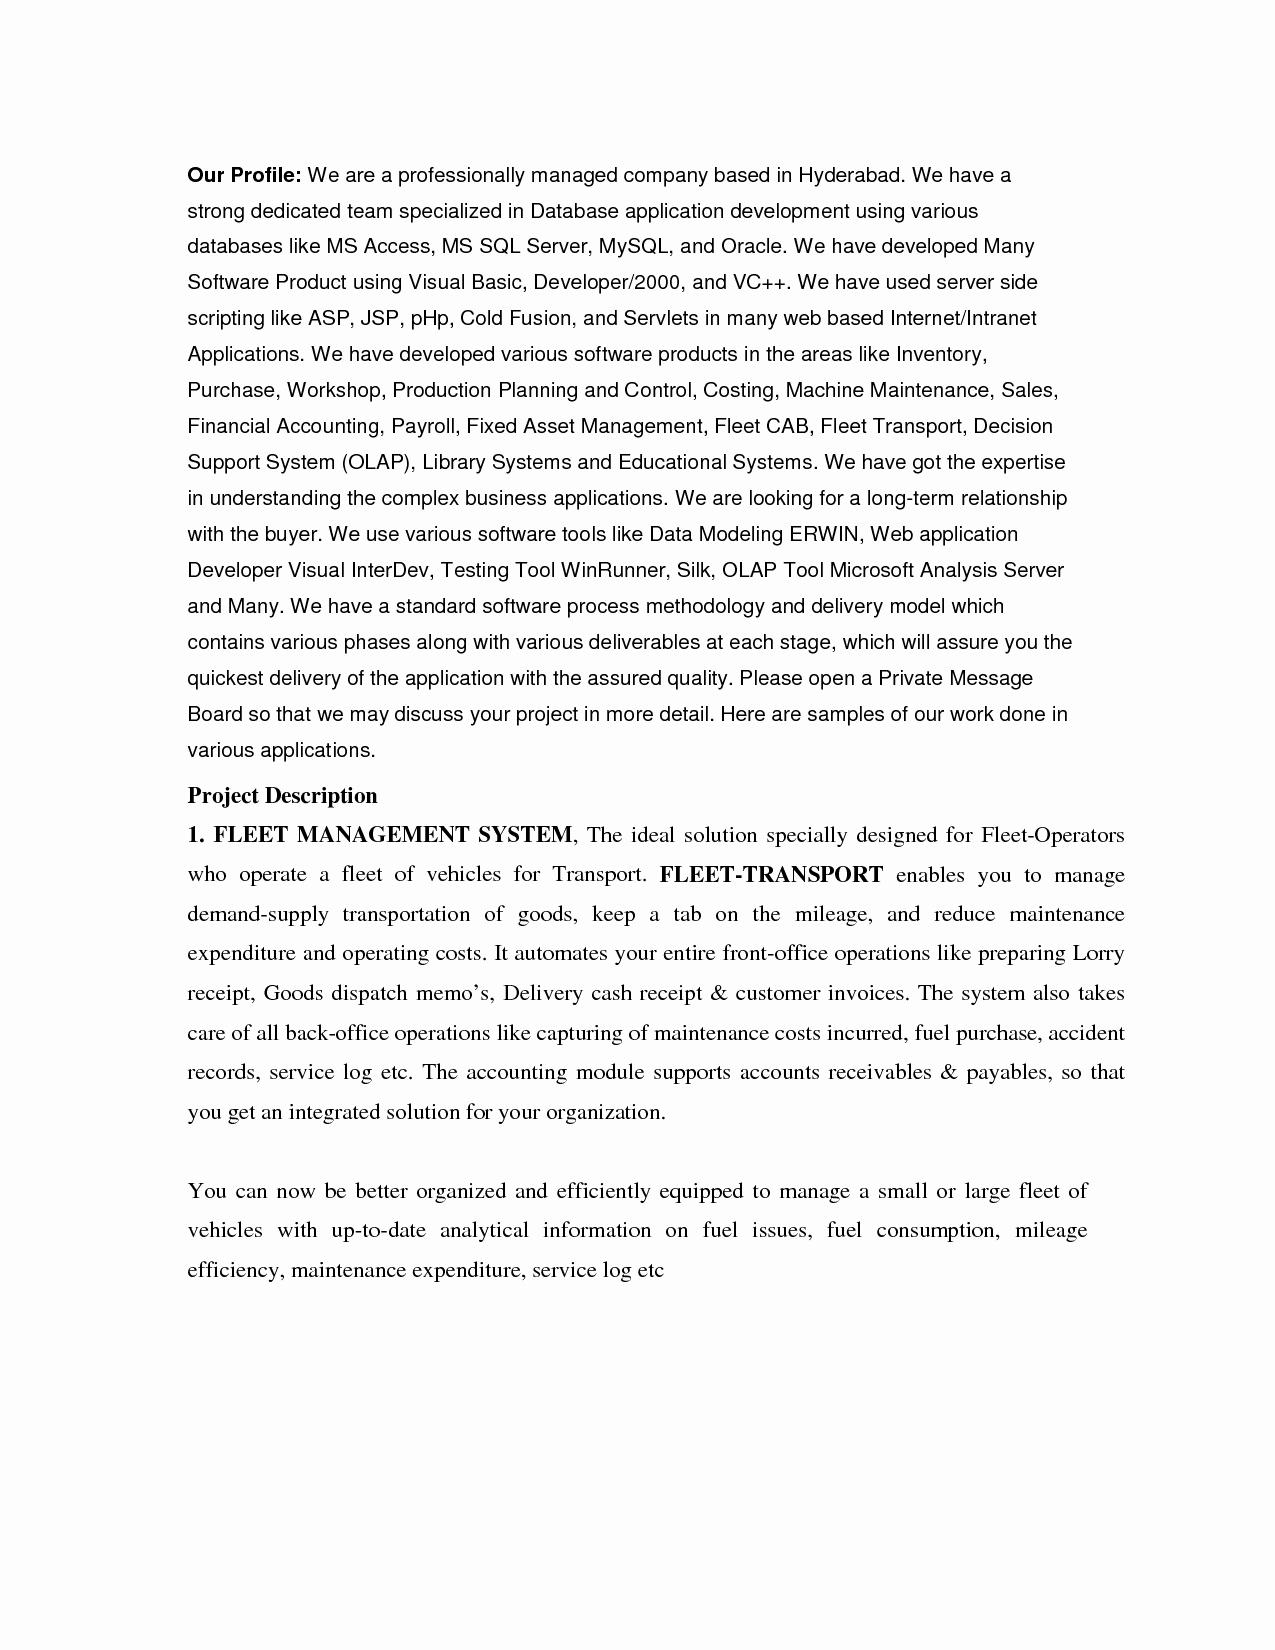 post sales introduction letter